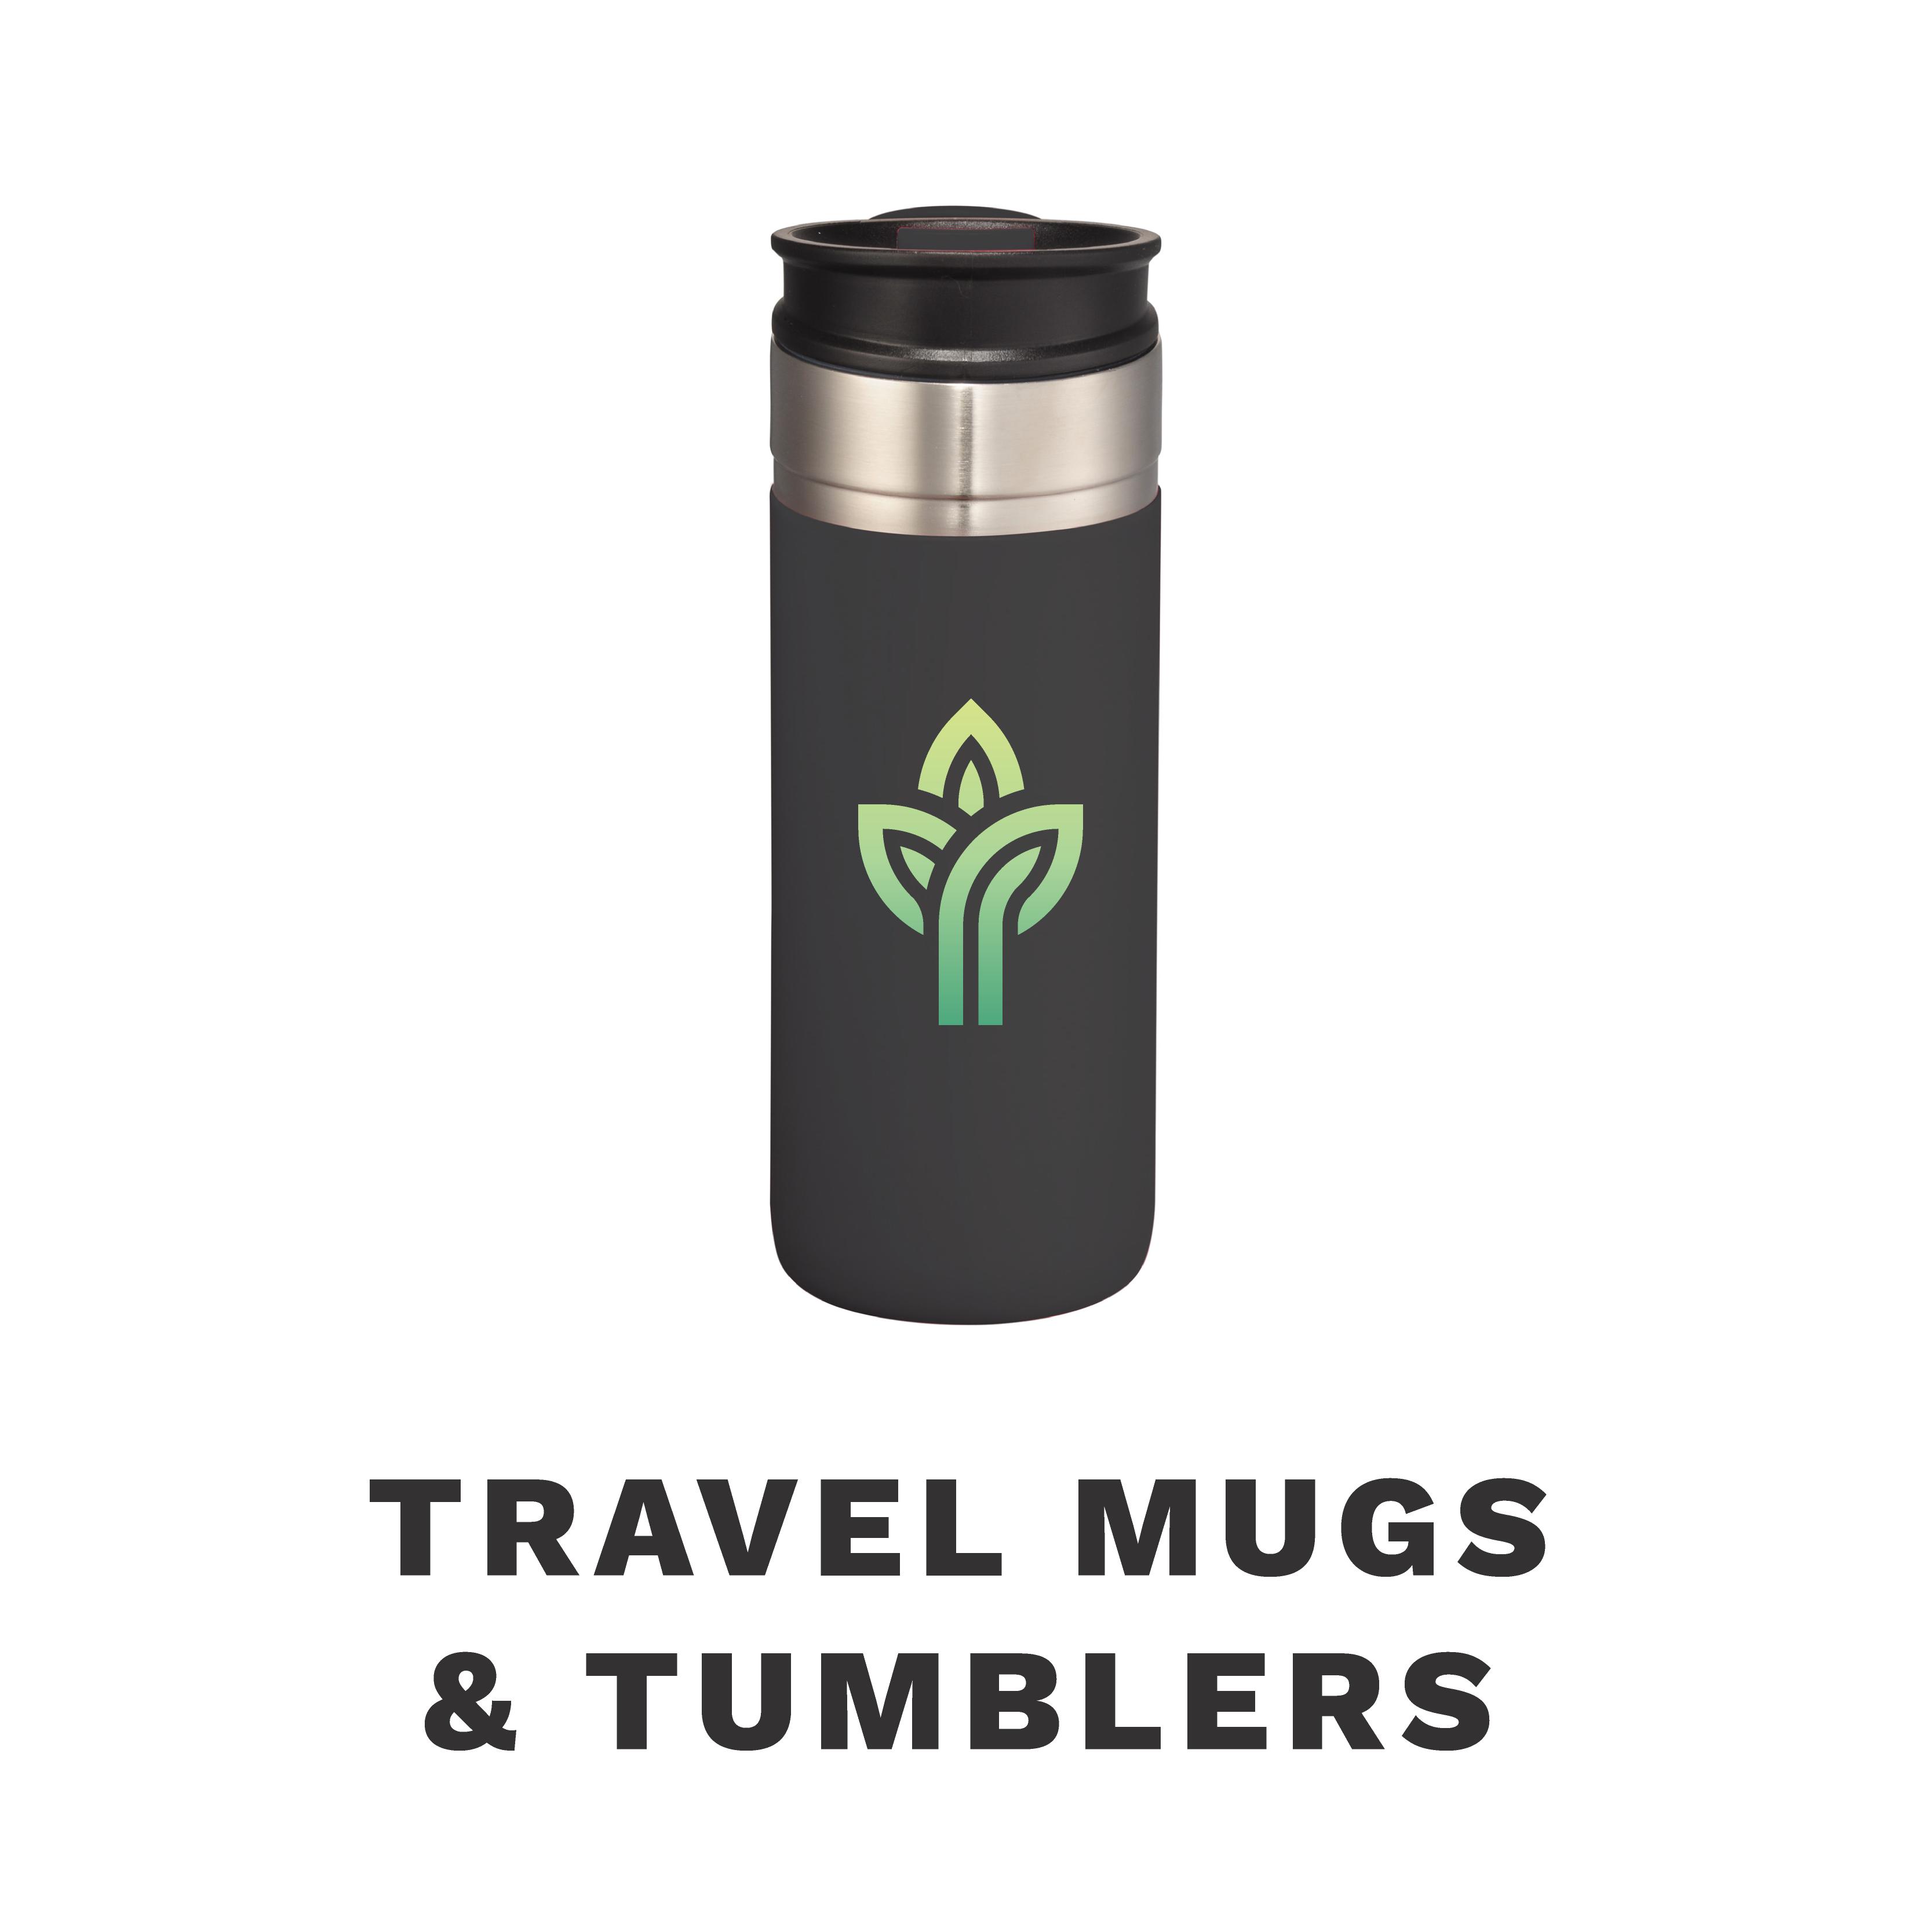 Your brand coffee tumbler